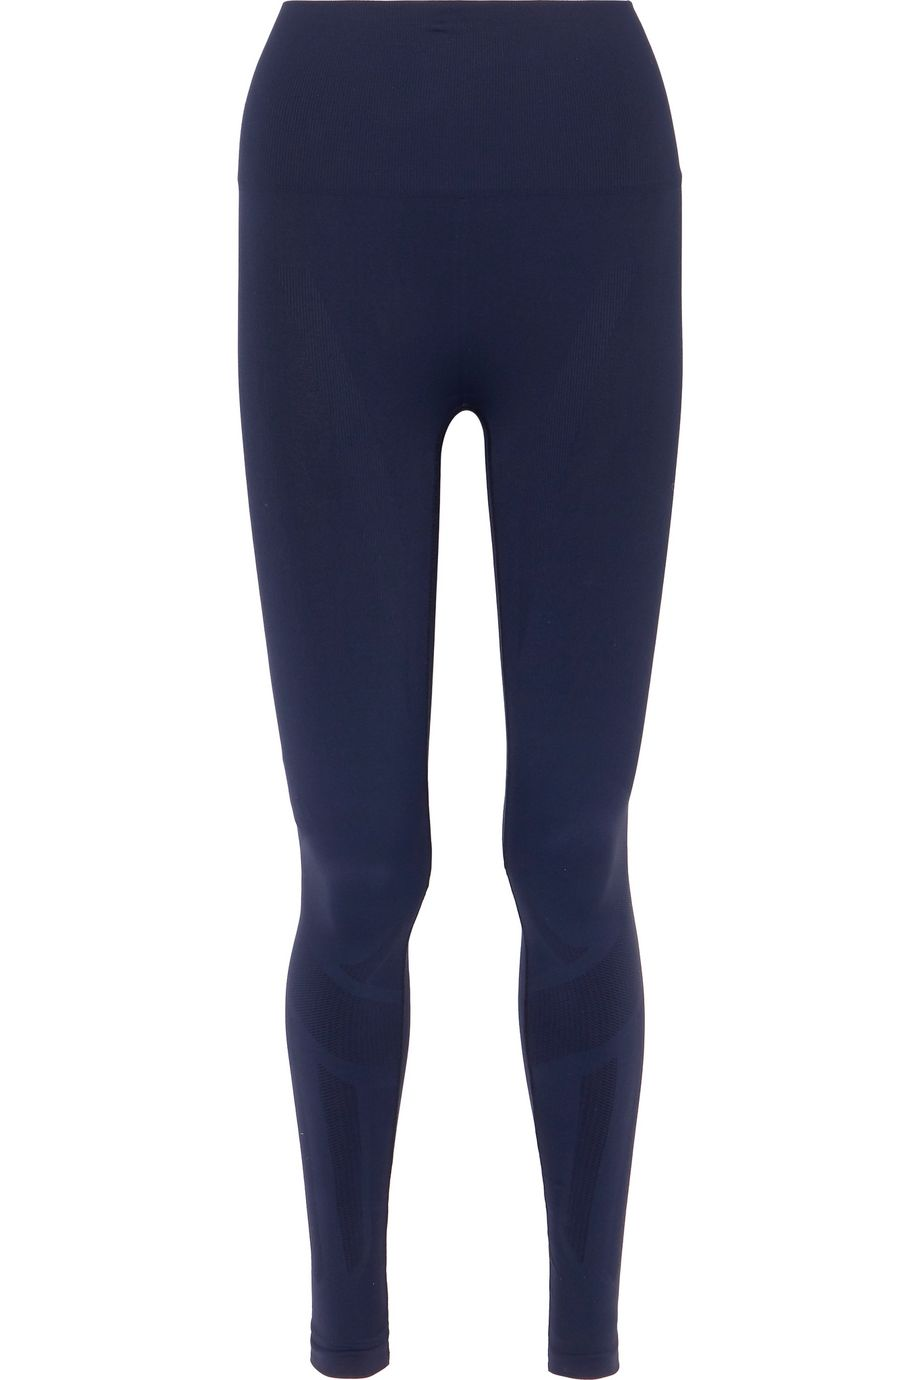 LNDR Eight Eight compression seamless stretch leggings